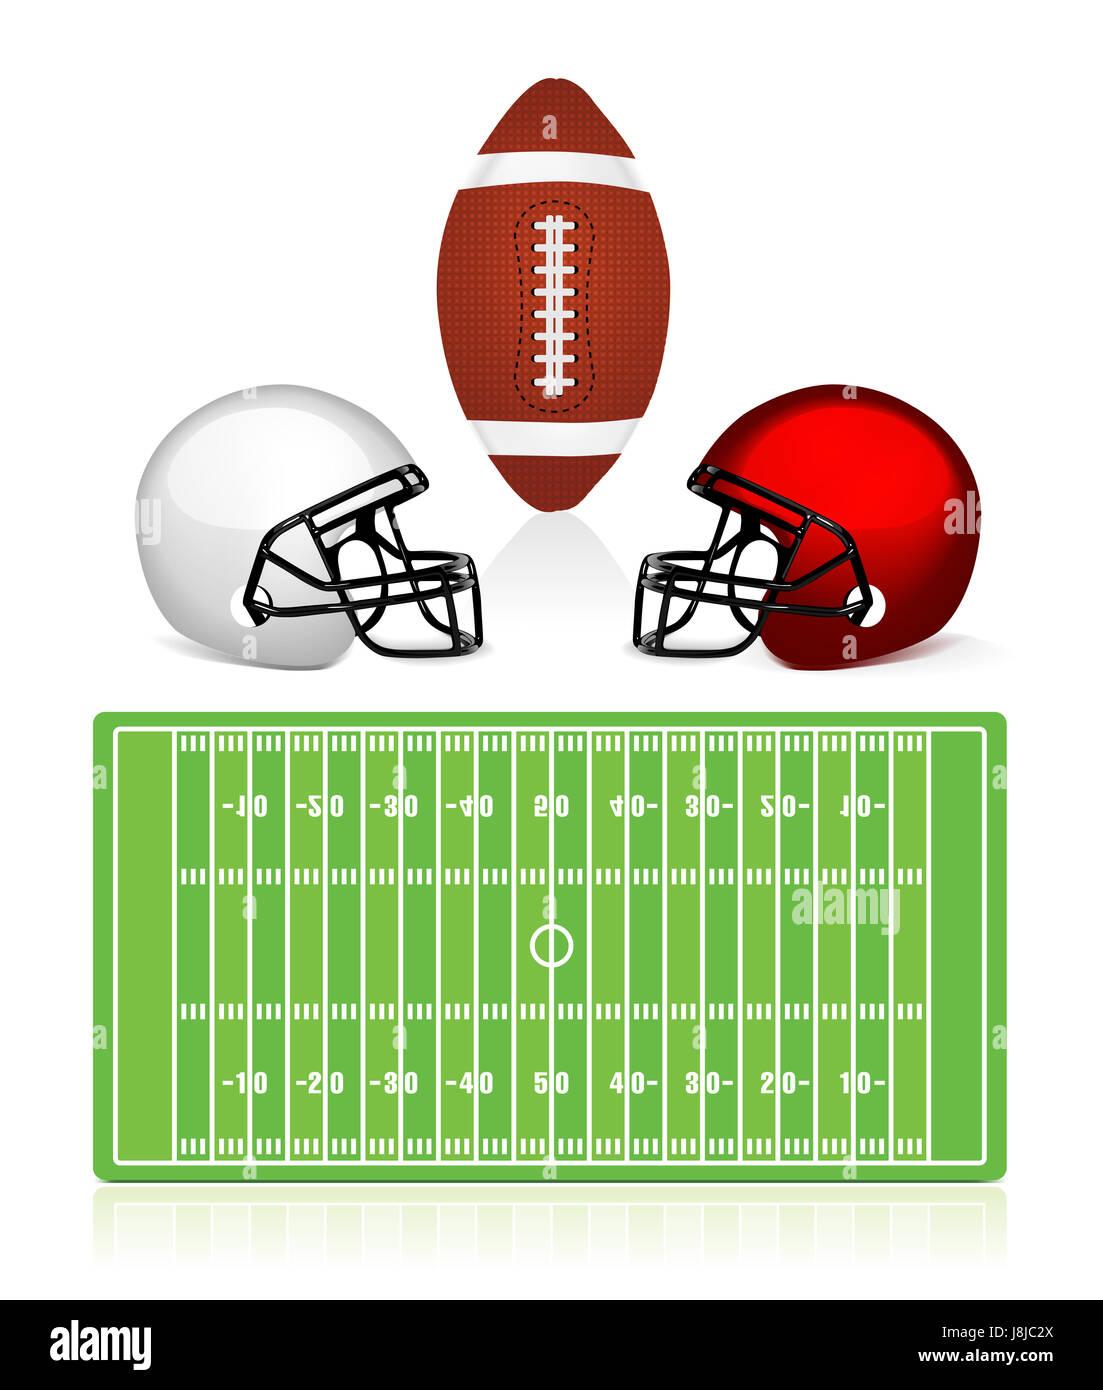 american, ball, field, helmet, sport, sports, soccer, football, humans, human - Stock Image